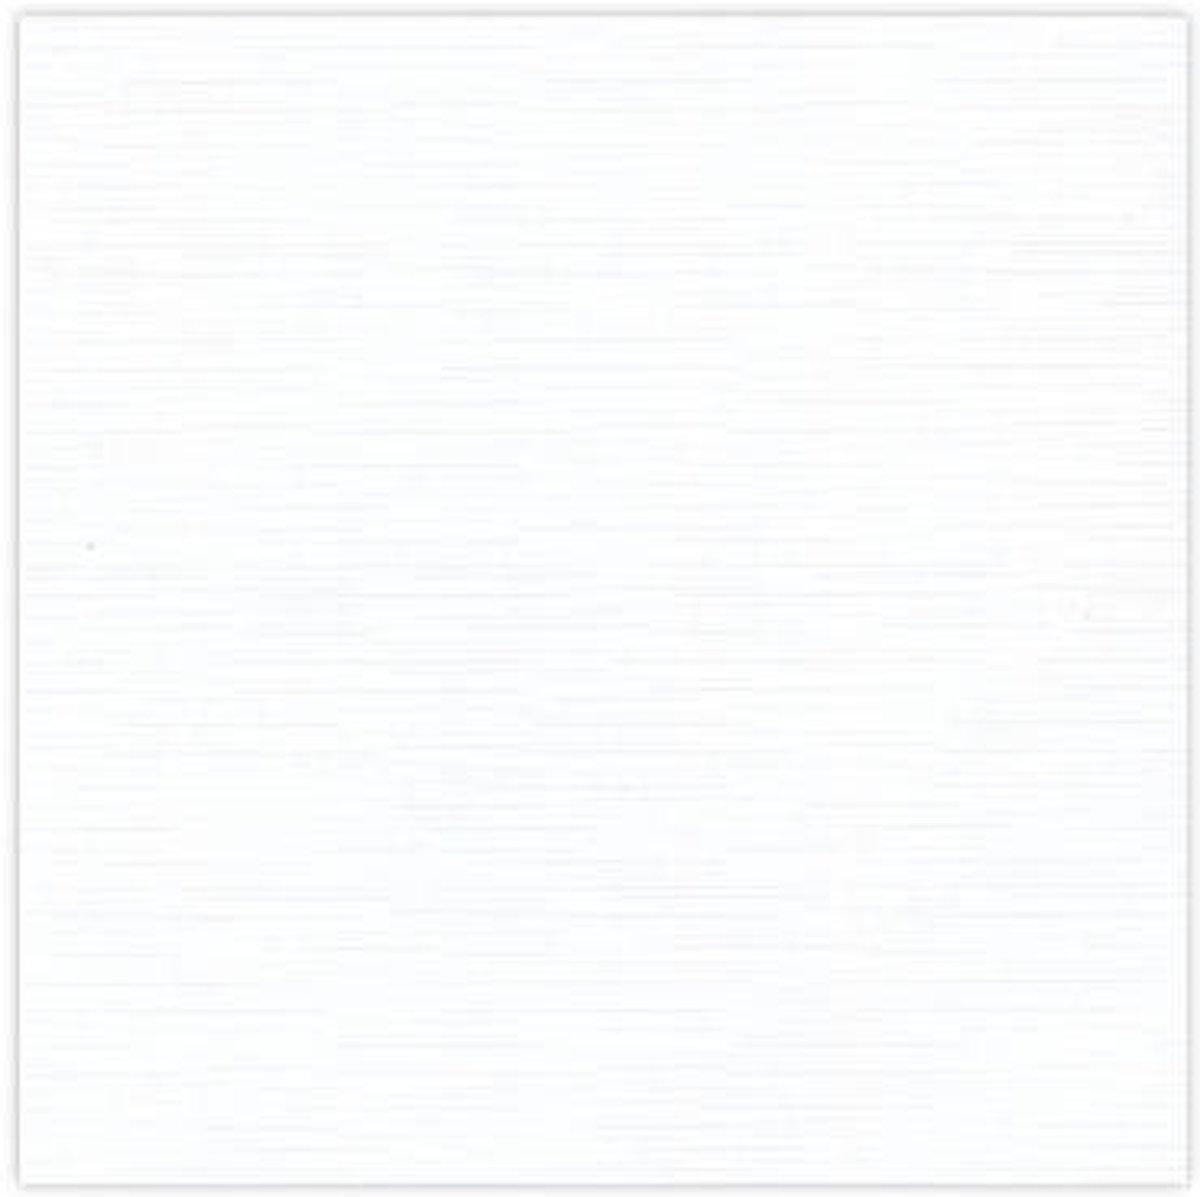 Linnenkarton - Oplegkaartjes - Wit kopen